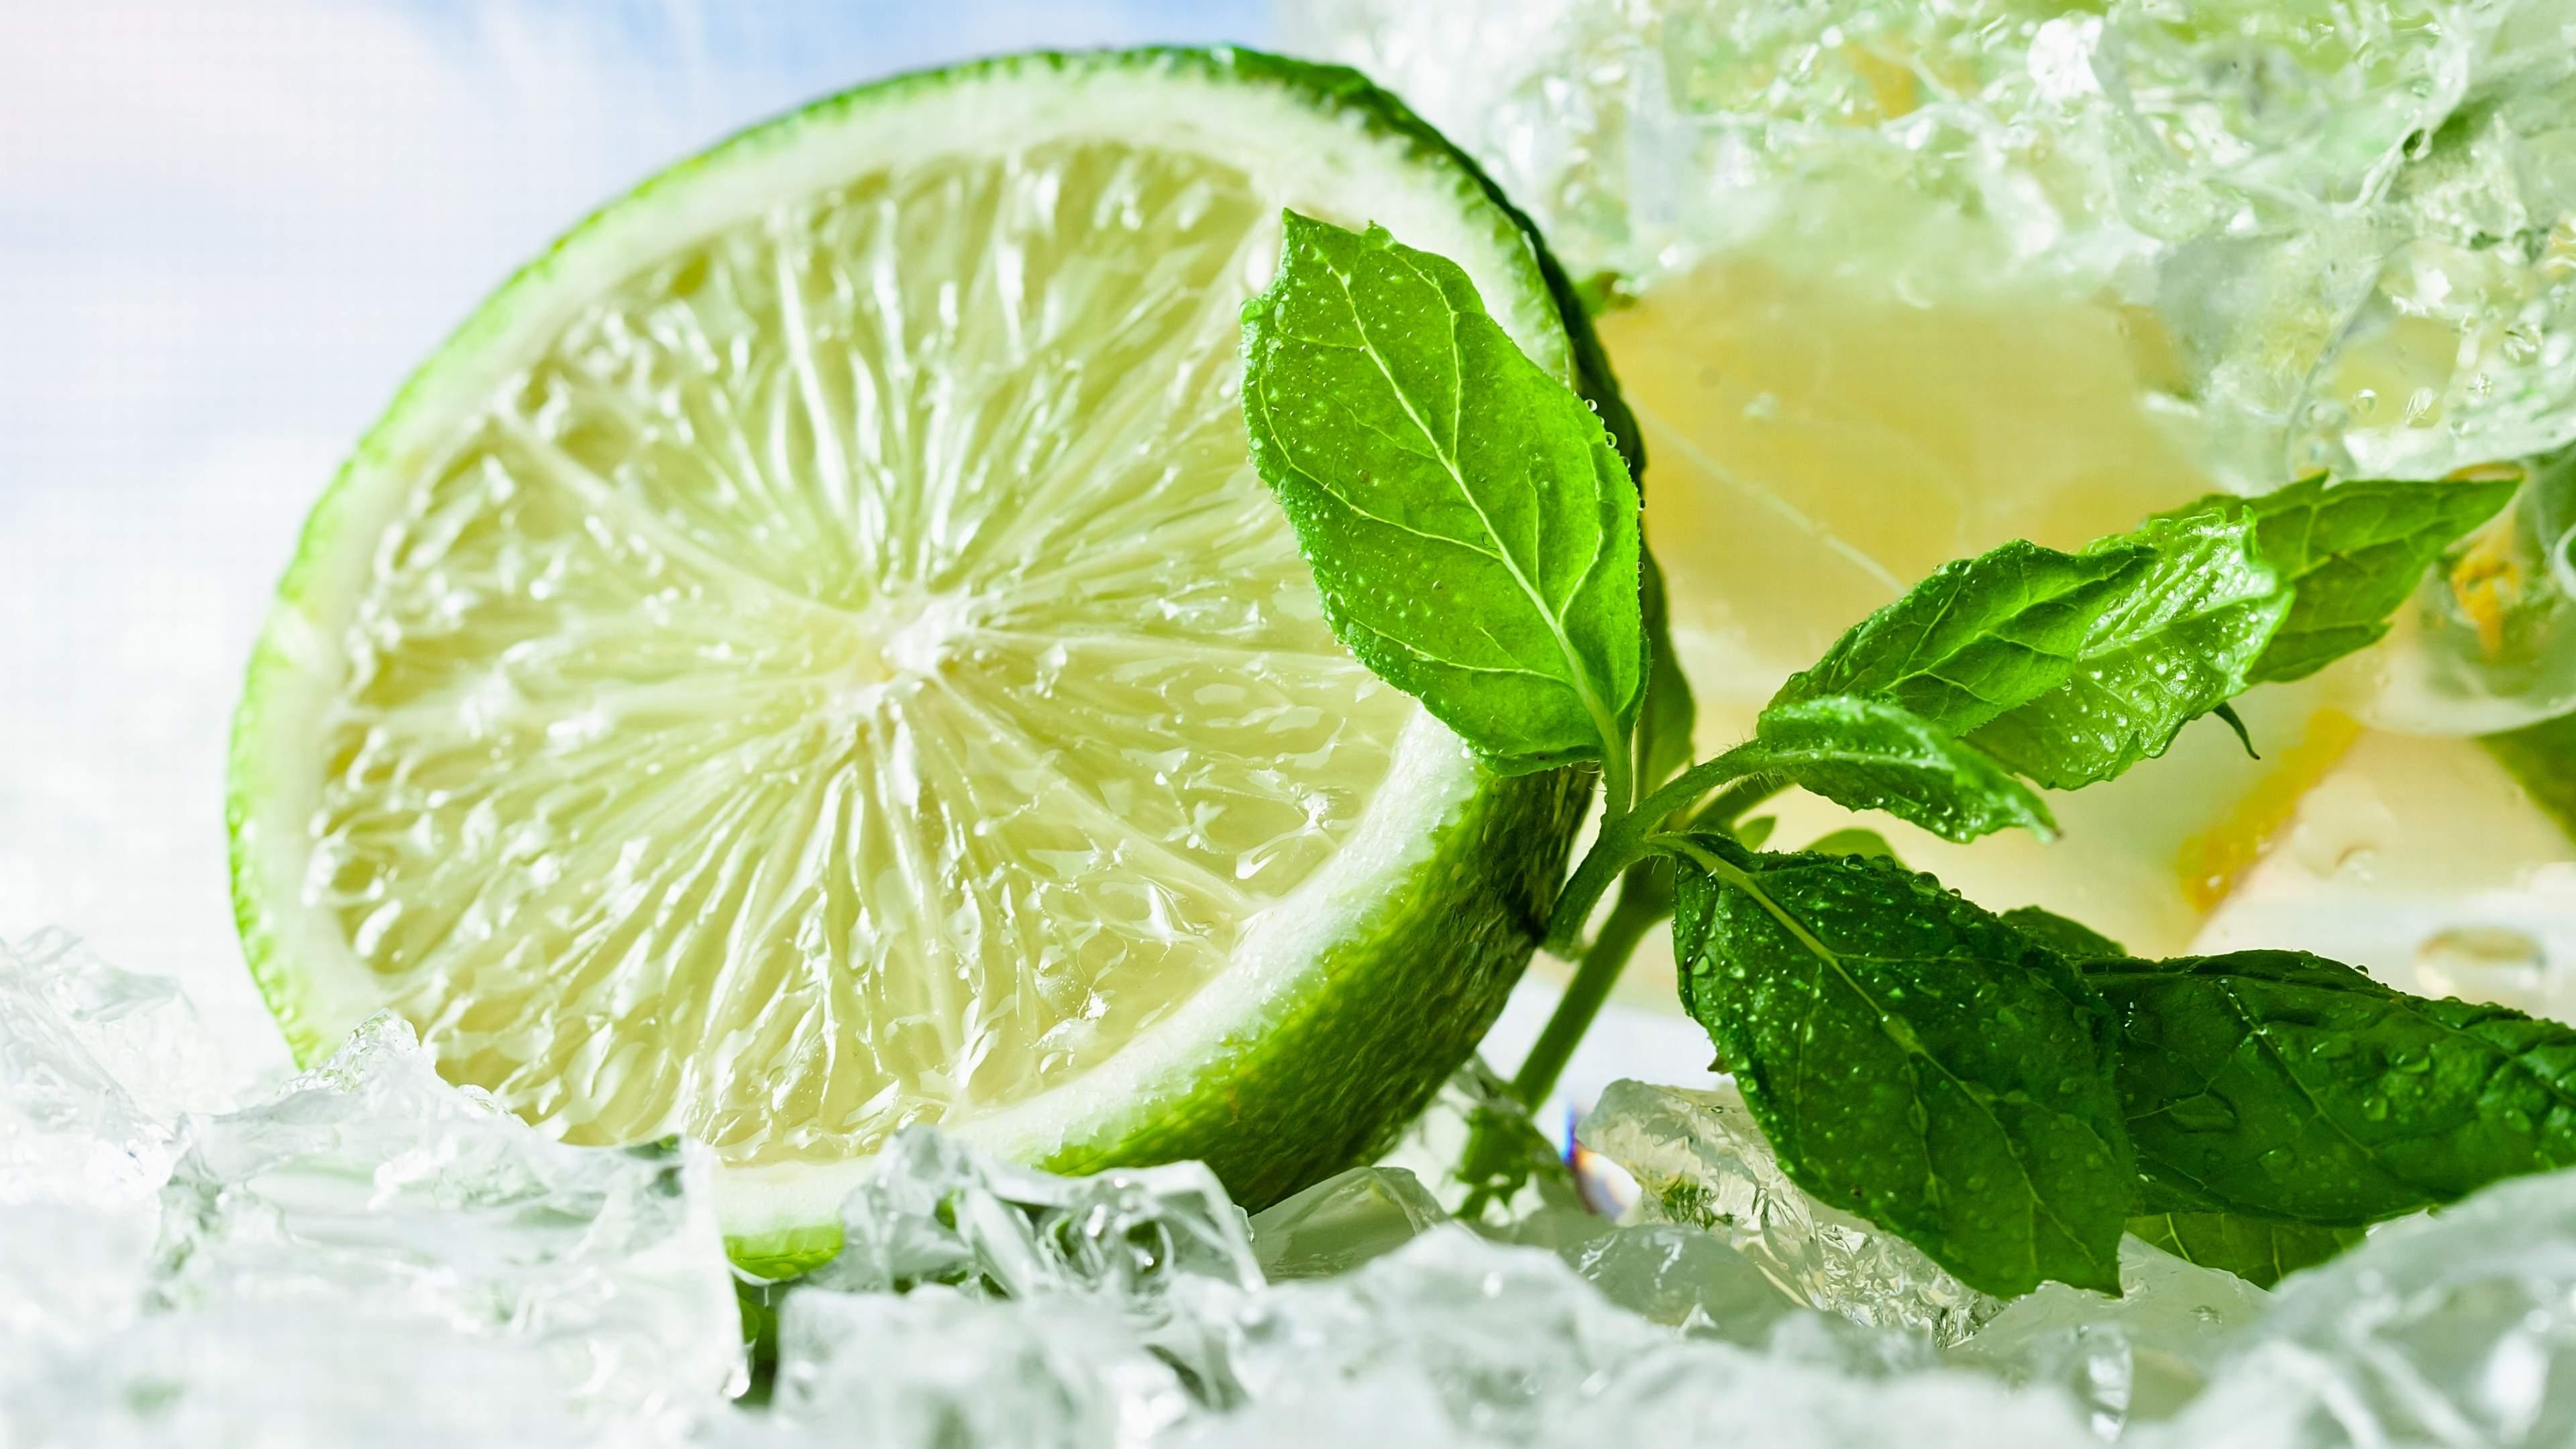 4k Green Lemon Wallpapers High Quality Download Free